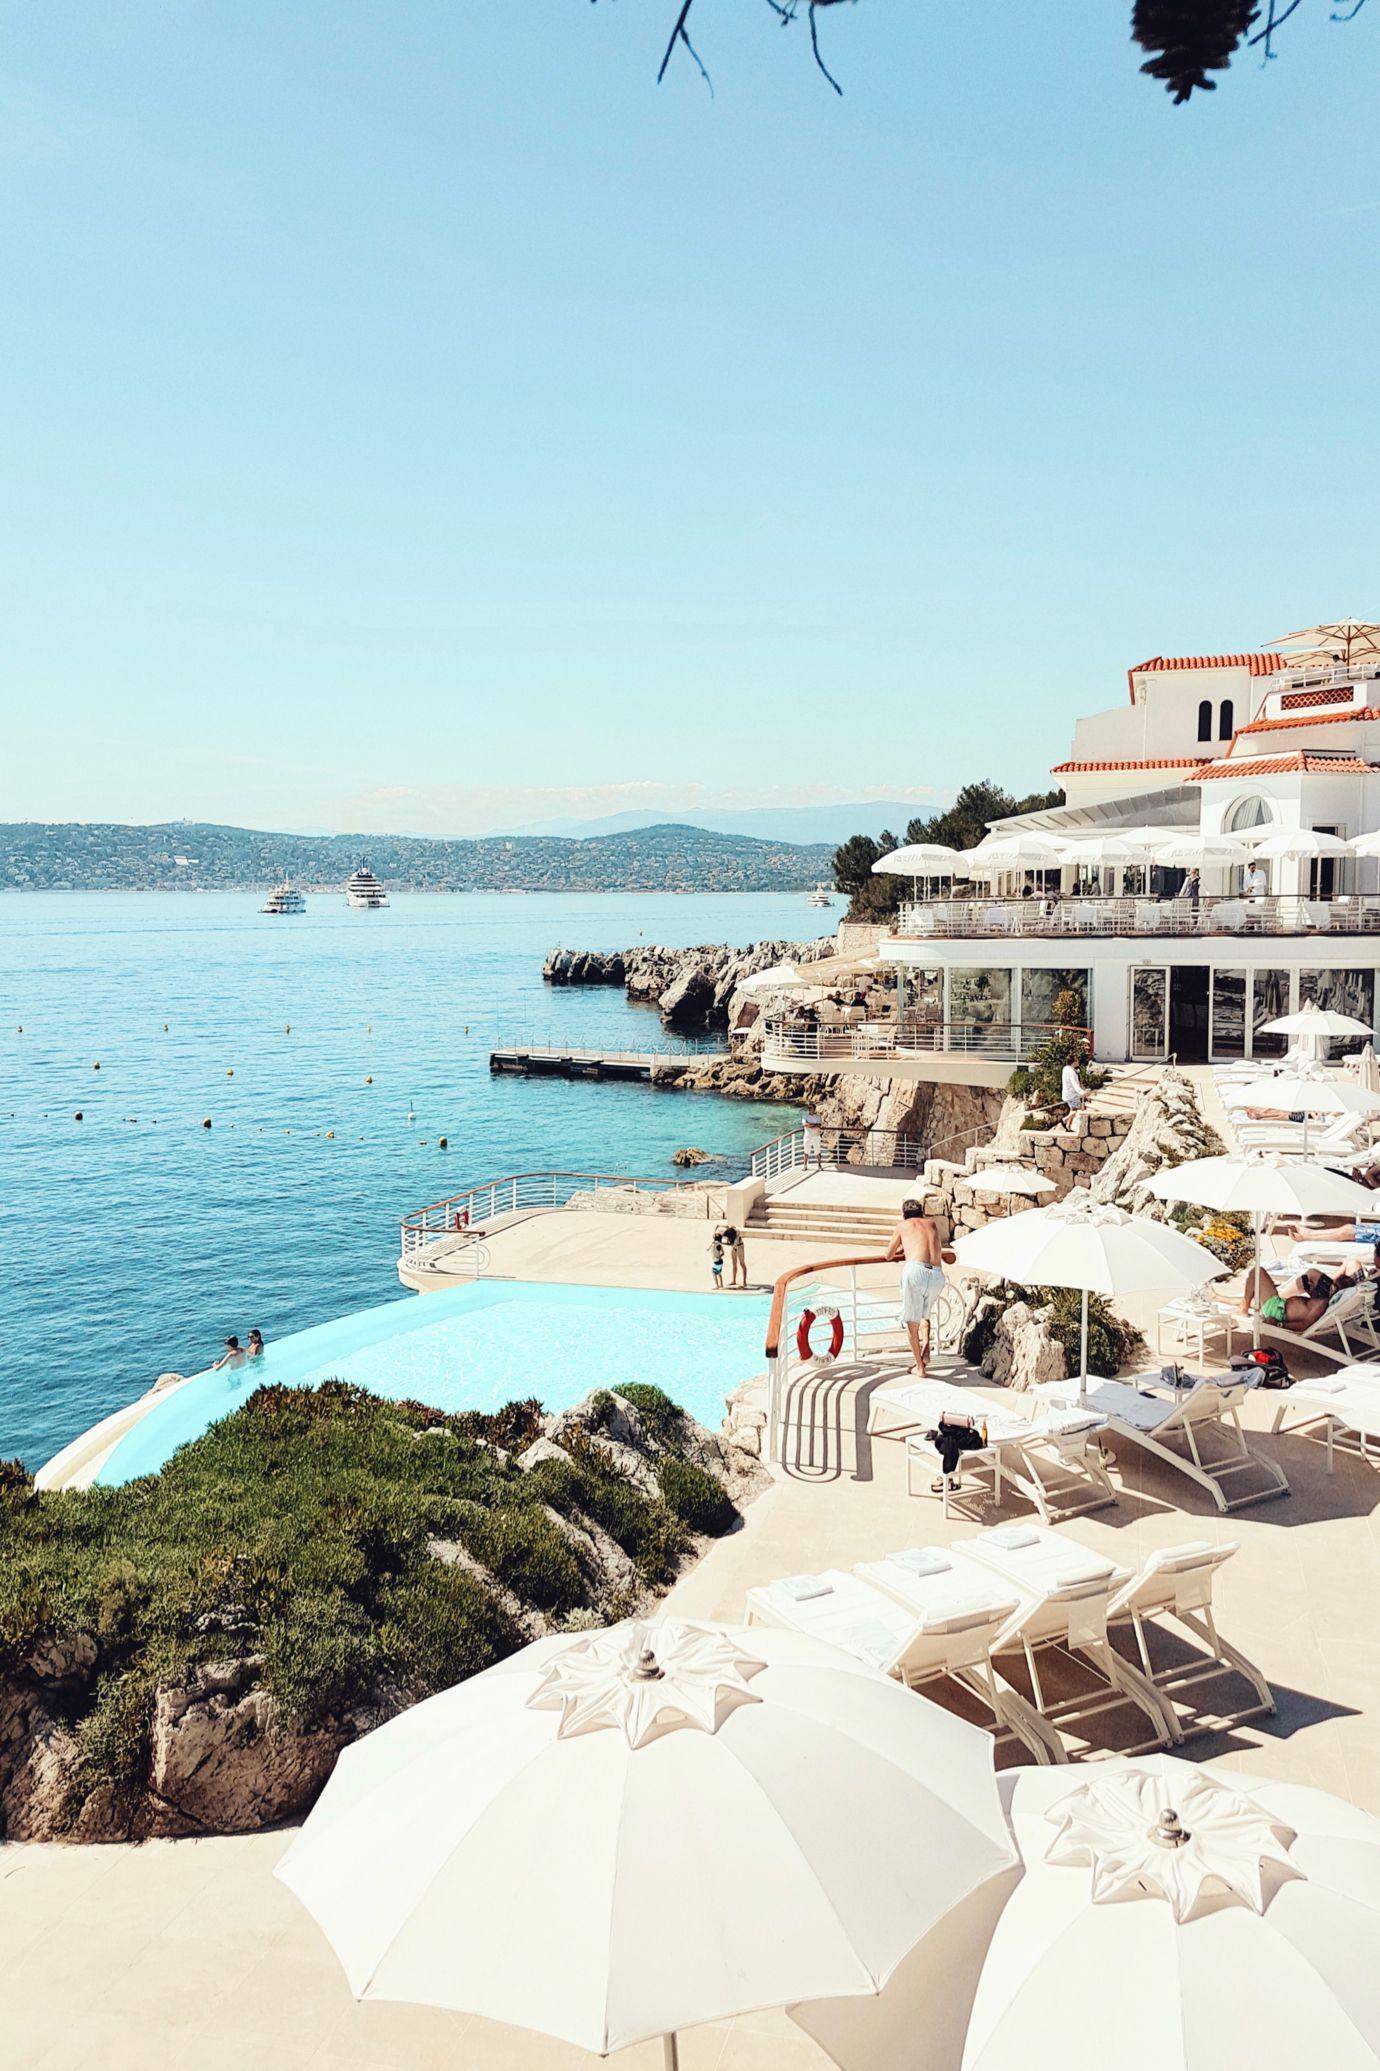 By the pool, Hotel du Cap Eden Roc   Cote d'Azur: http://www.ohhcouture.com/2017/06/miss-dior-for-love-cote-dazur-2/ #leoniehanne #ohhcouture